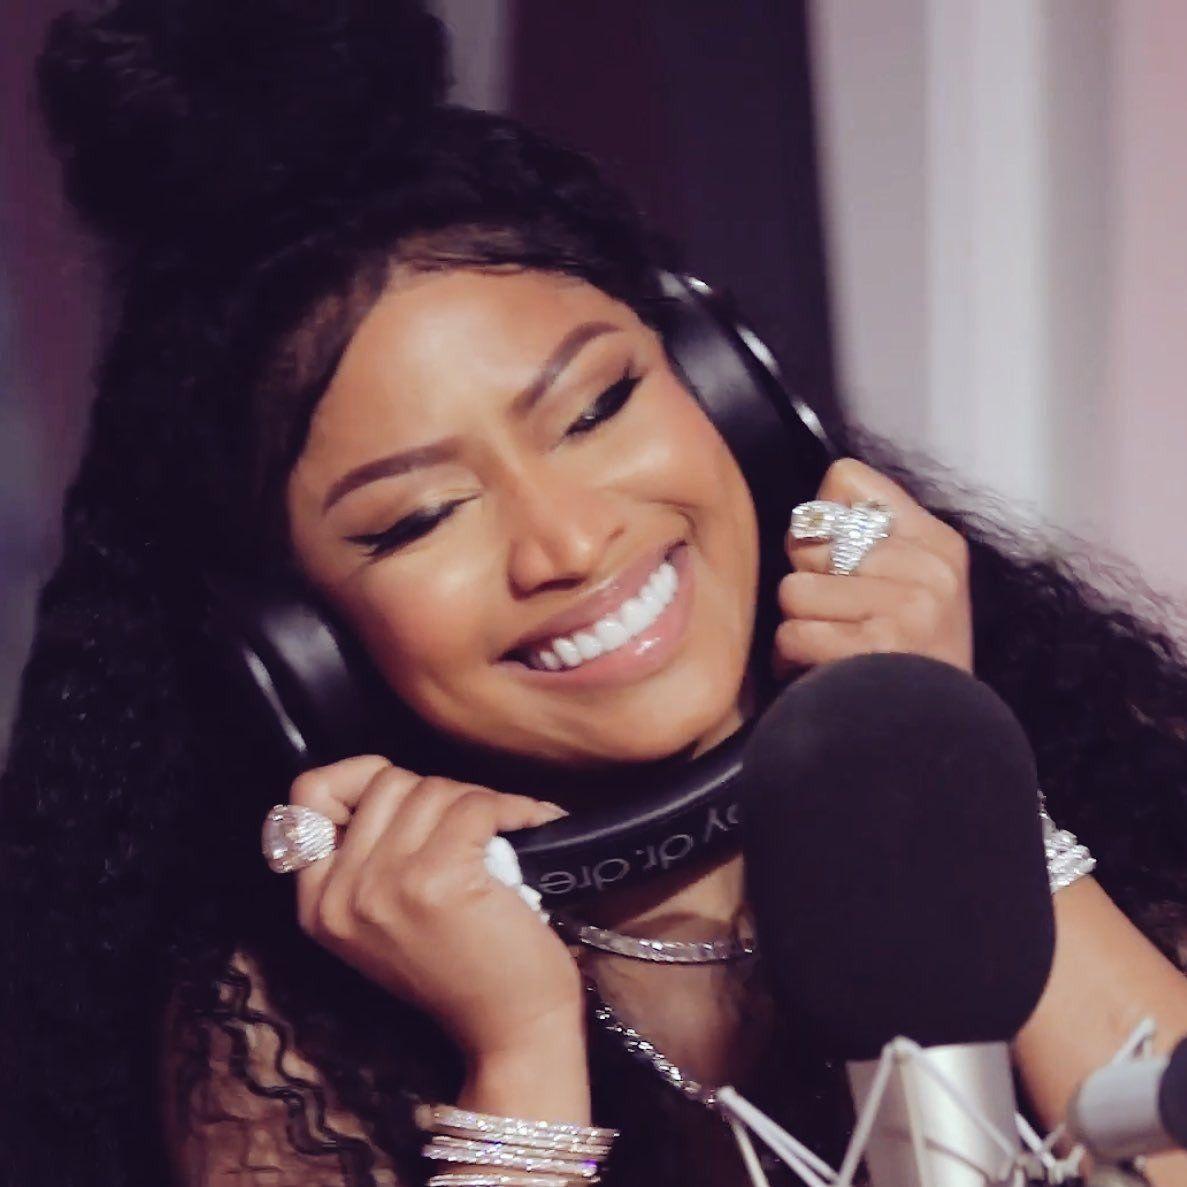 YG Said He Won't Work With Nicki Minaj Again After She Did The Collab With Tekashi 69 #MeekMill, #NickiMinaj, #Tekashi69, #YG celebrityinsider.org #Music #celebrityinsider #celebrities #celebrity #rumors #gossip #celebritynews